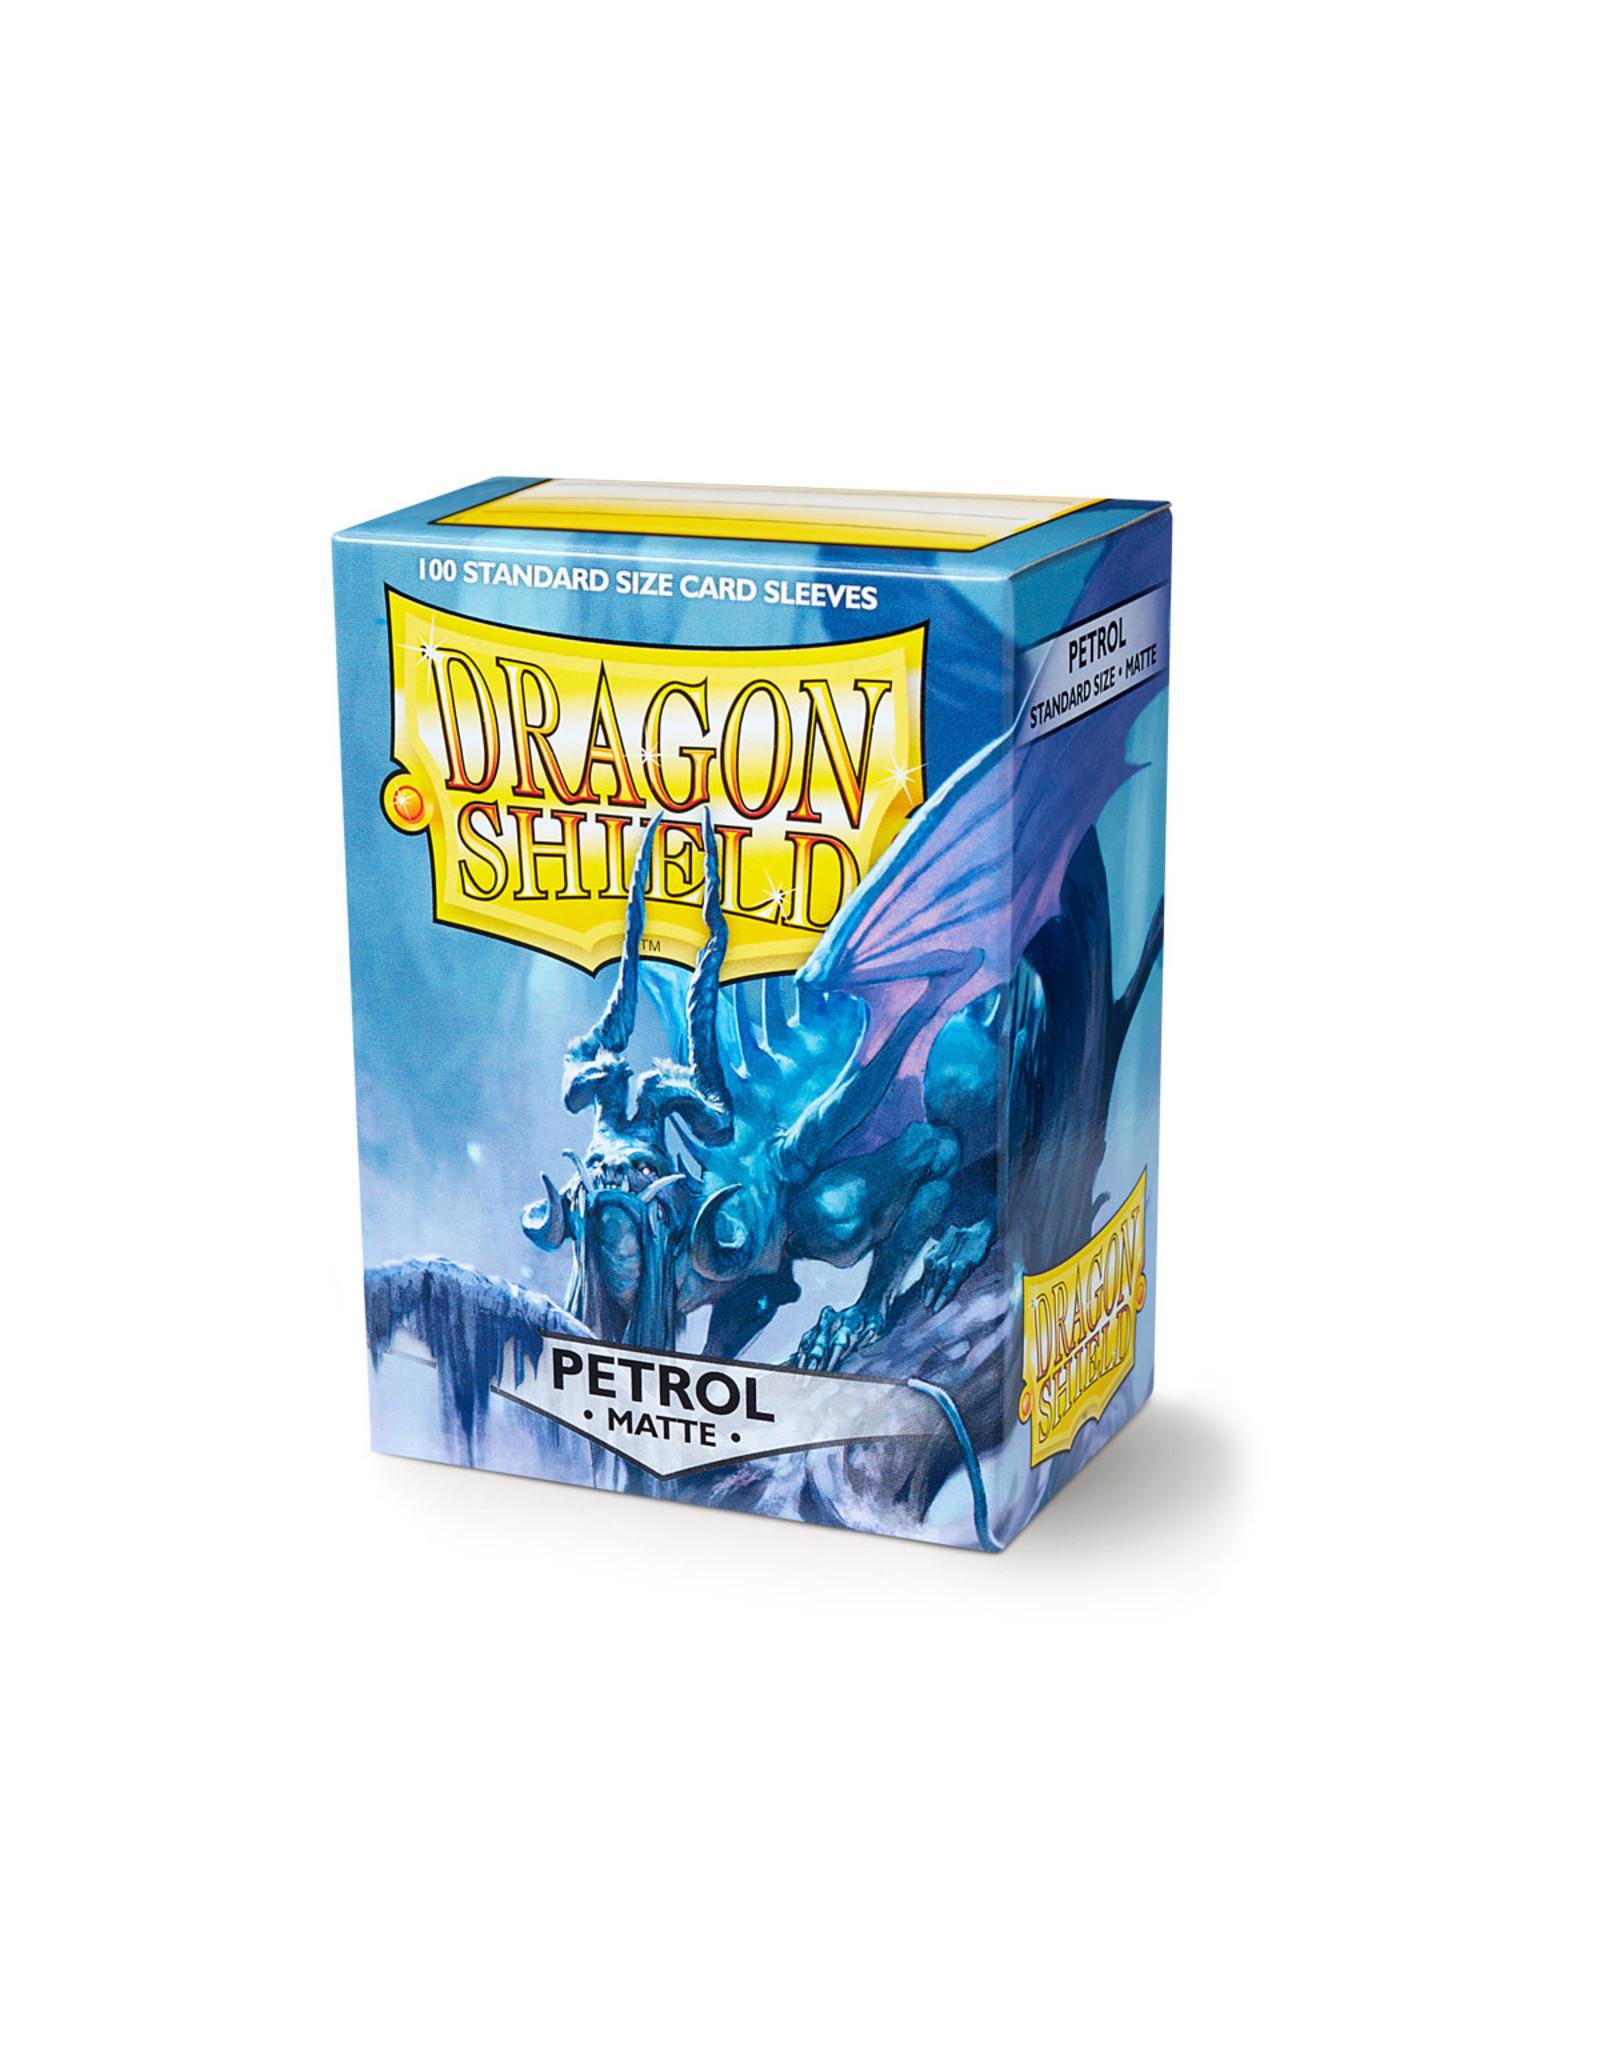 Arcane Tinmen Dragon Shield: Matte Petrol Card Sleeves 100 Count